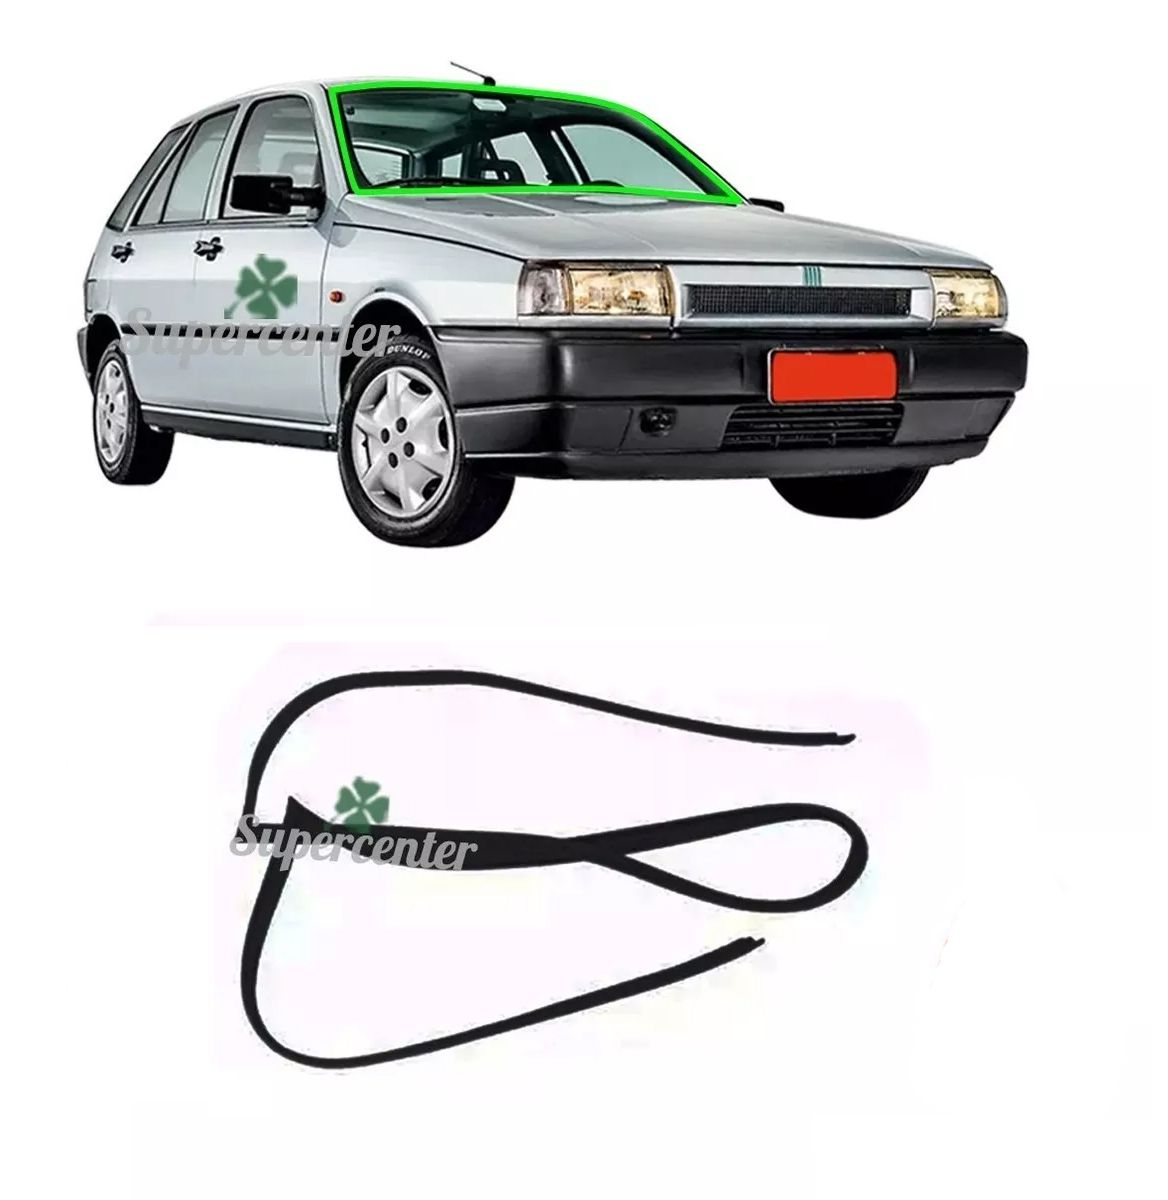 Borracha Externa Parabrisa Fiat Tipo 1993 Até 1997